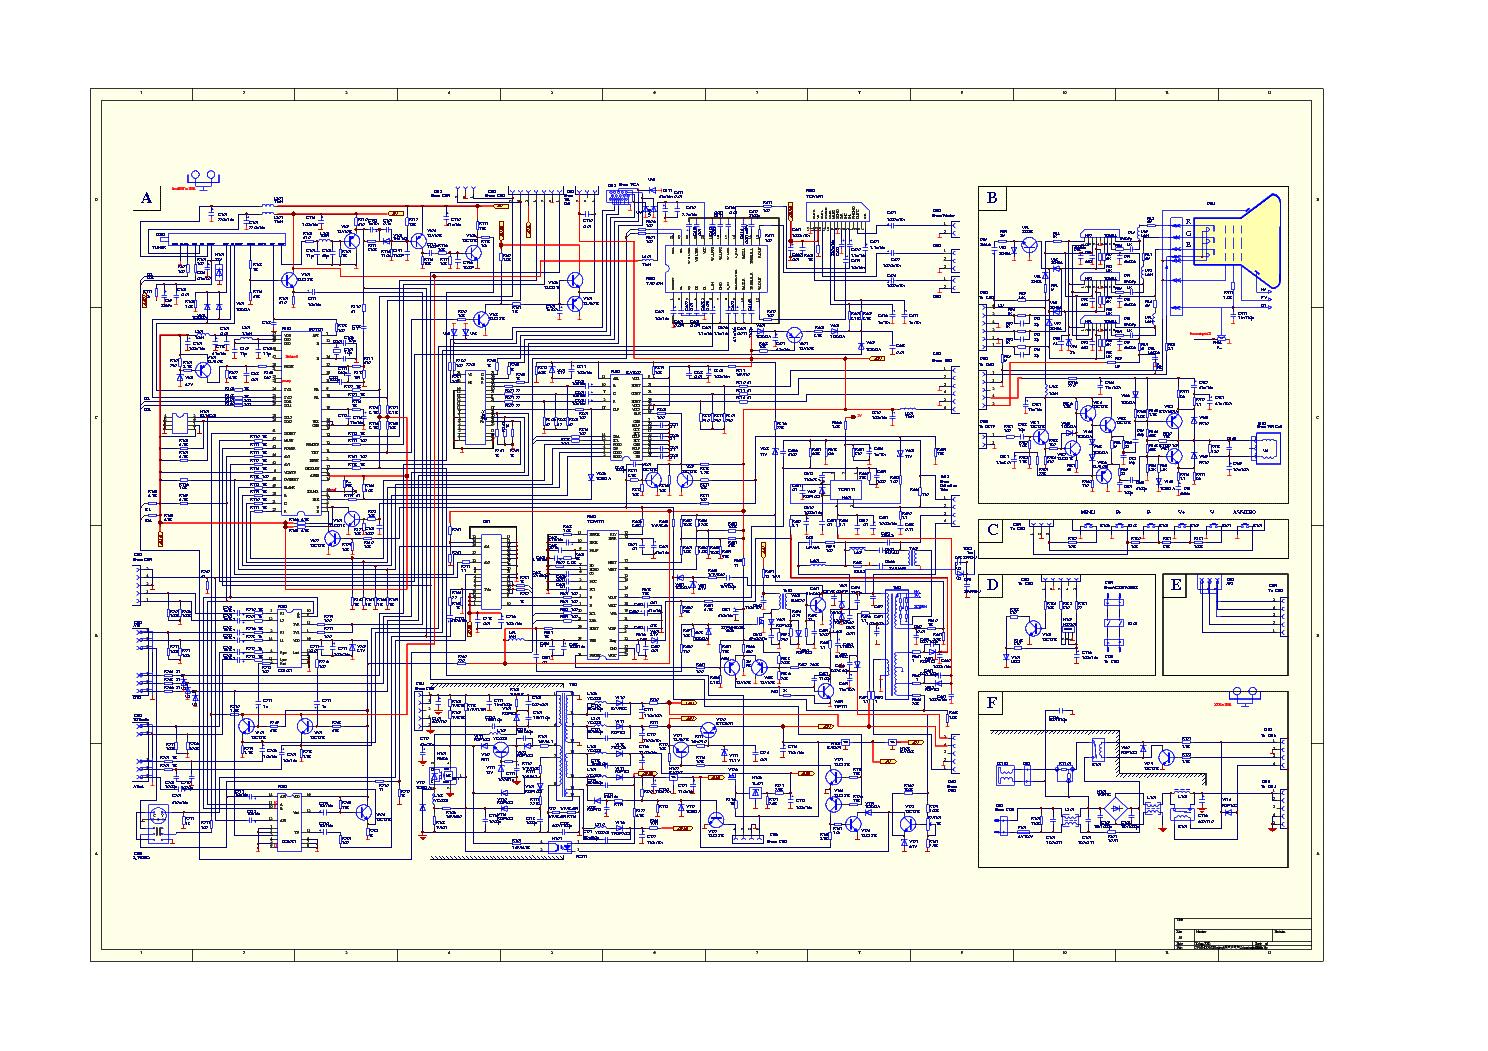 HAIER L39F6 MB95M IDTV SM Service Manual download, schematics